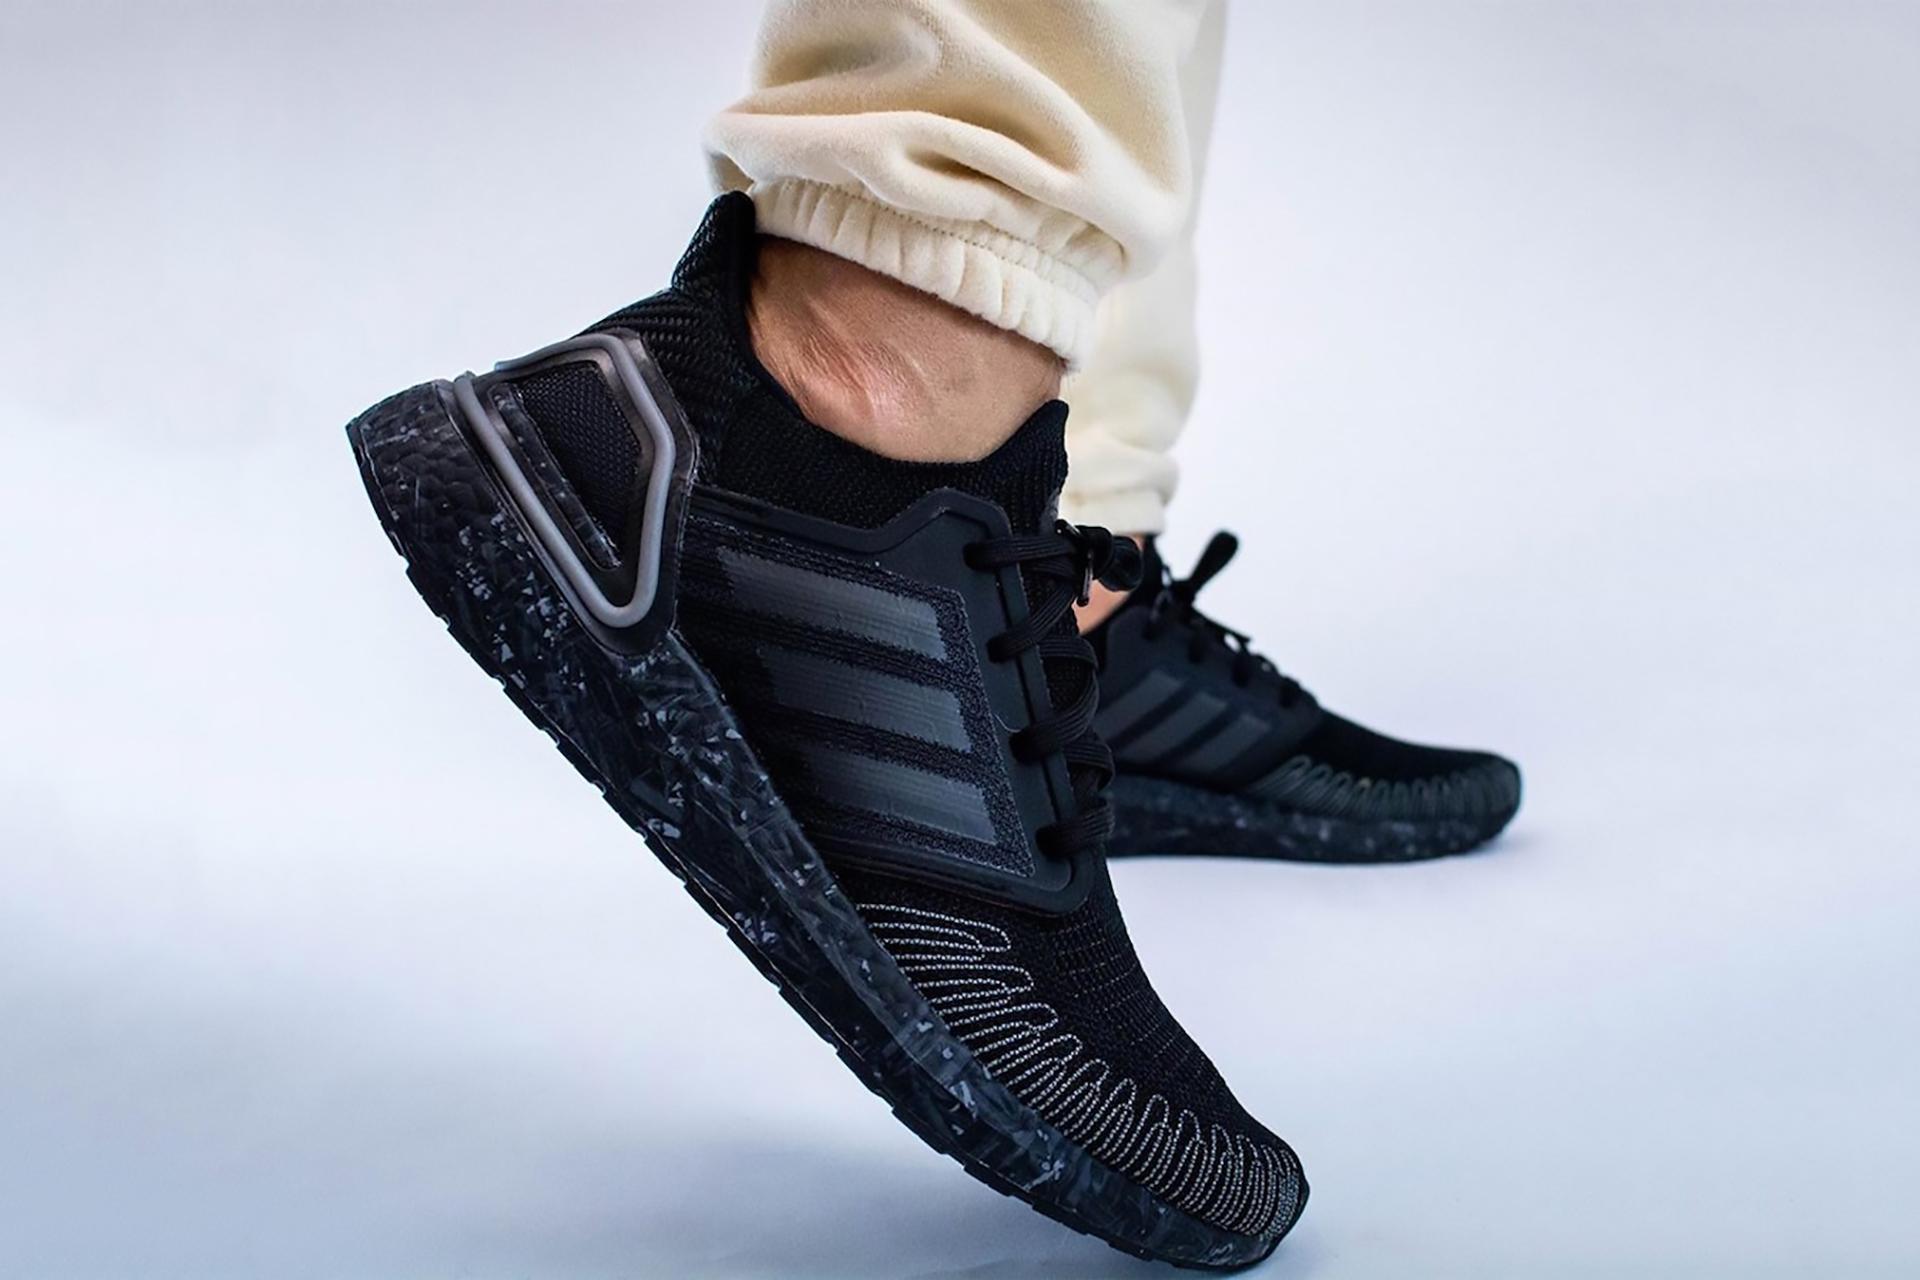 Acercarse lona club  Adidas x James Bond Ultraboost 20 Sneaker | Uncrate